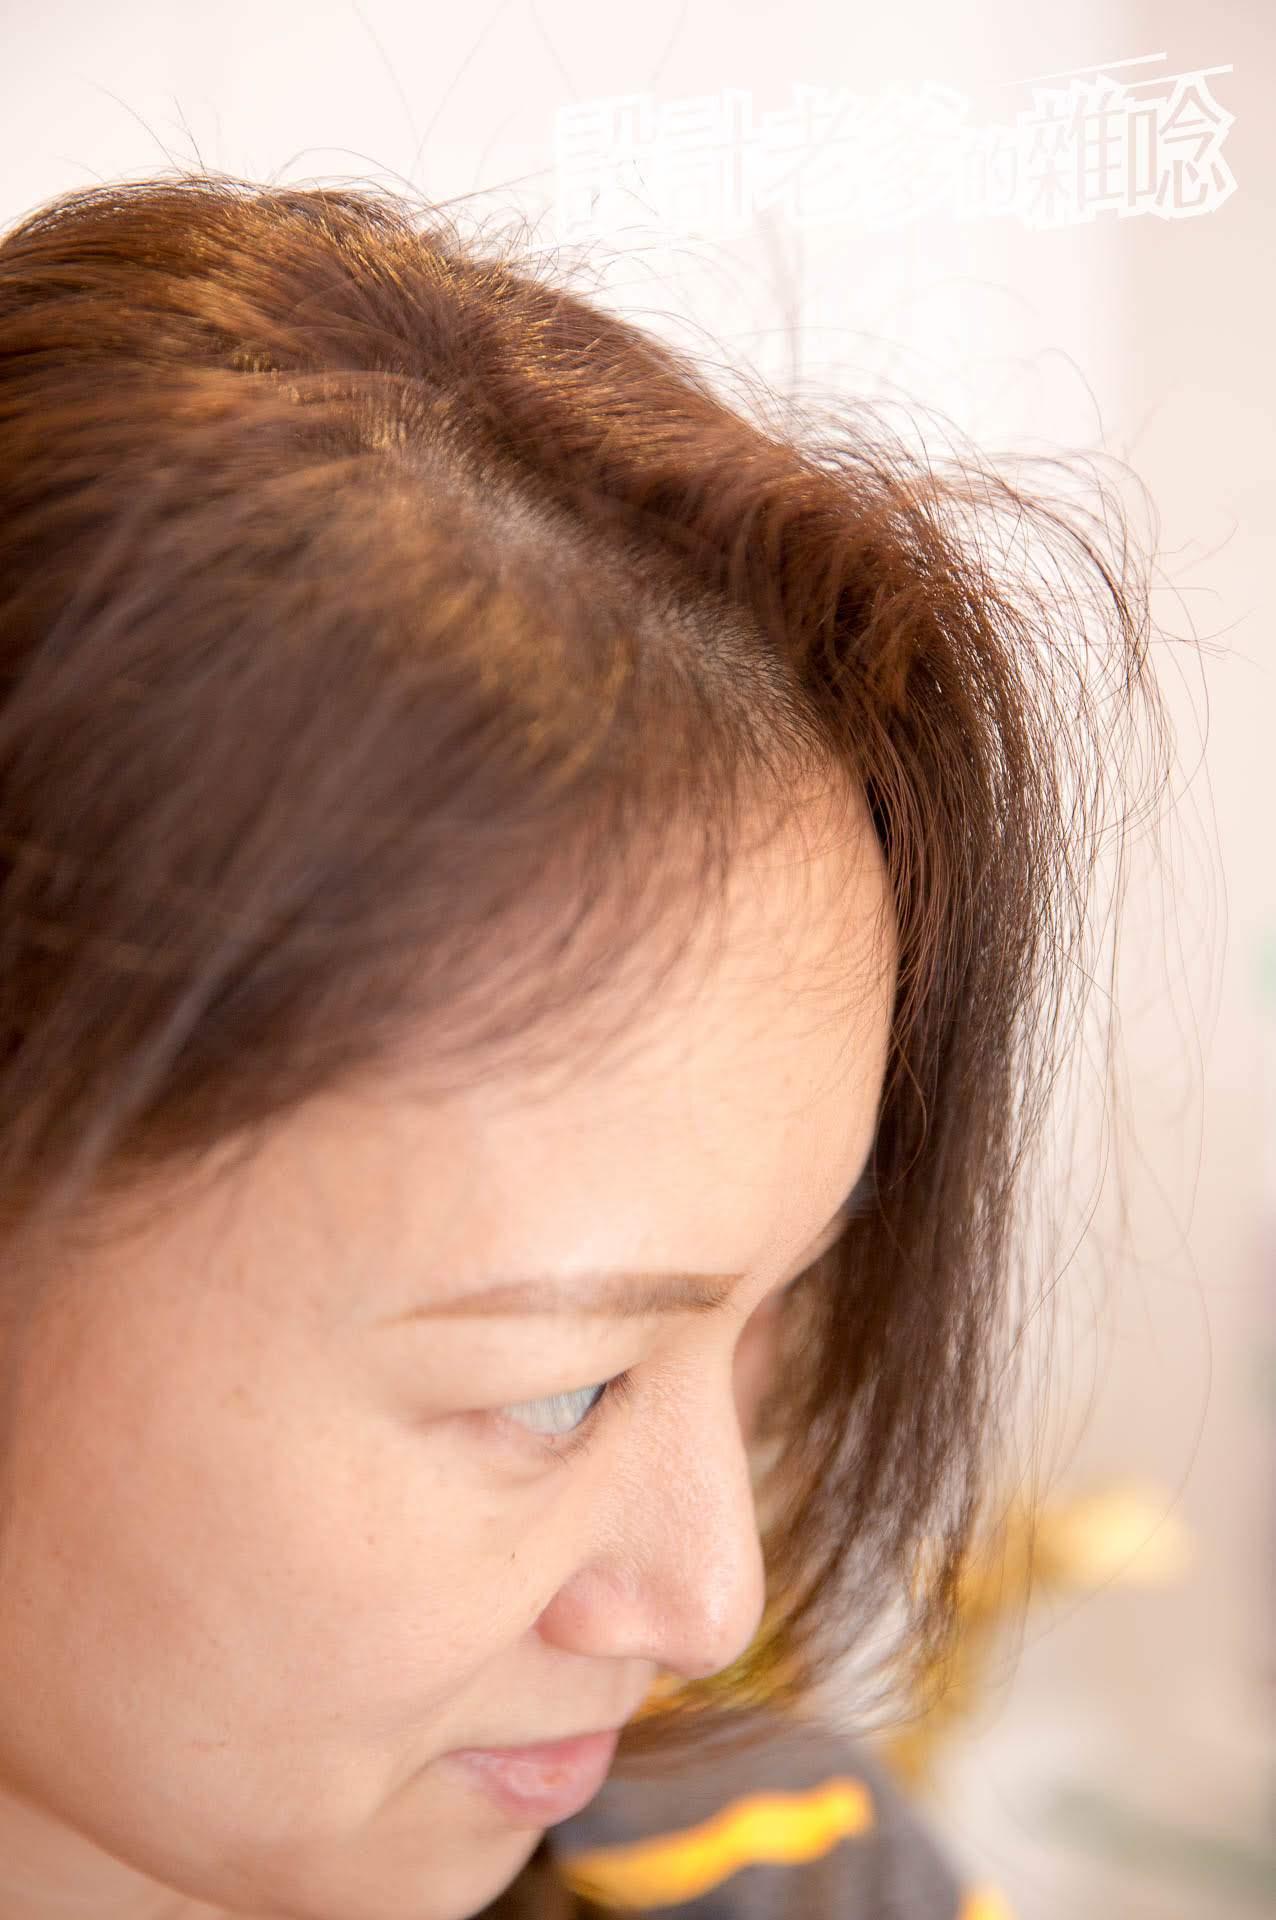 FreshLight富麗絲小布娃娃染髮劑,Fresh Light富麗絲小布娃娃染髮劑(蜜糖棕)...天冷就是要變髮維新!